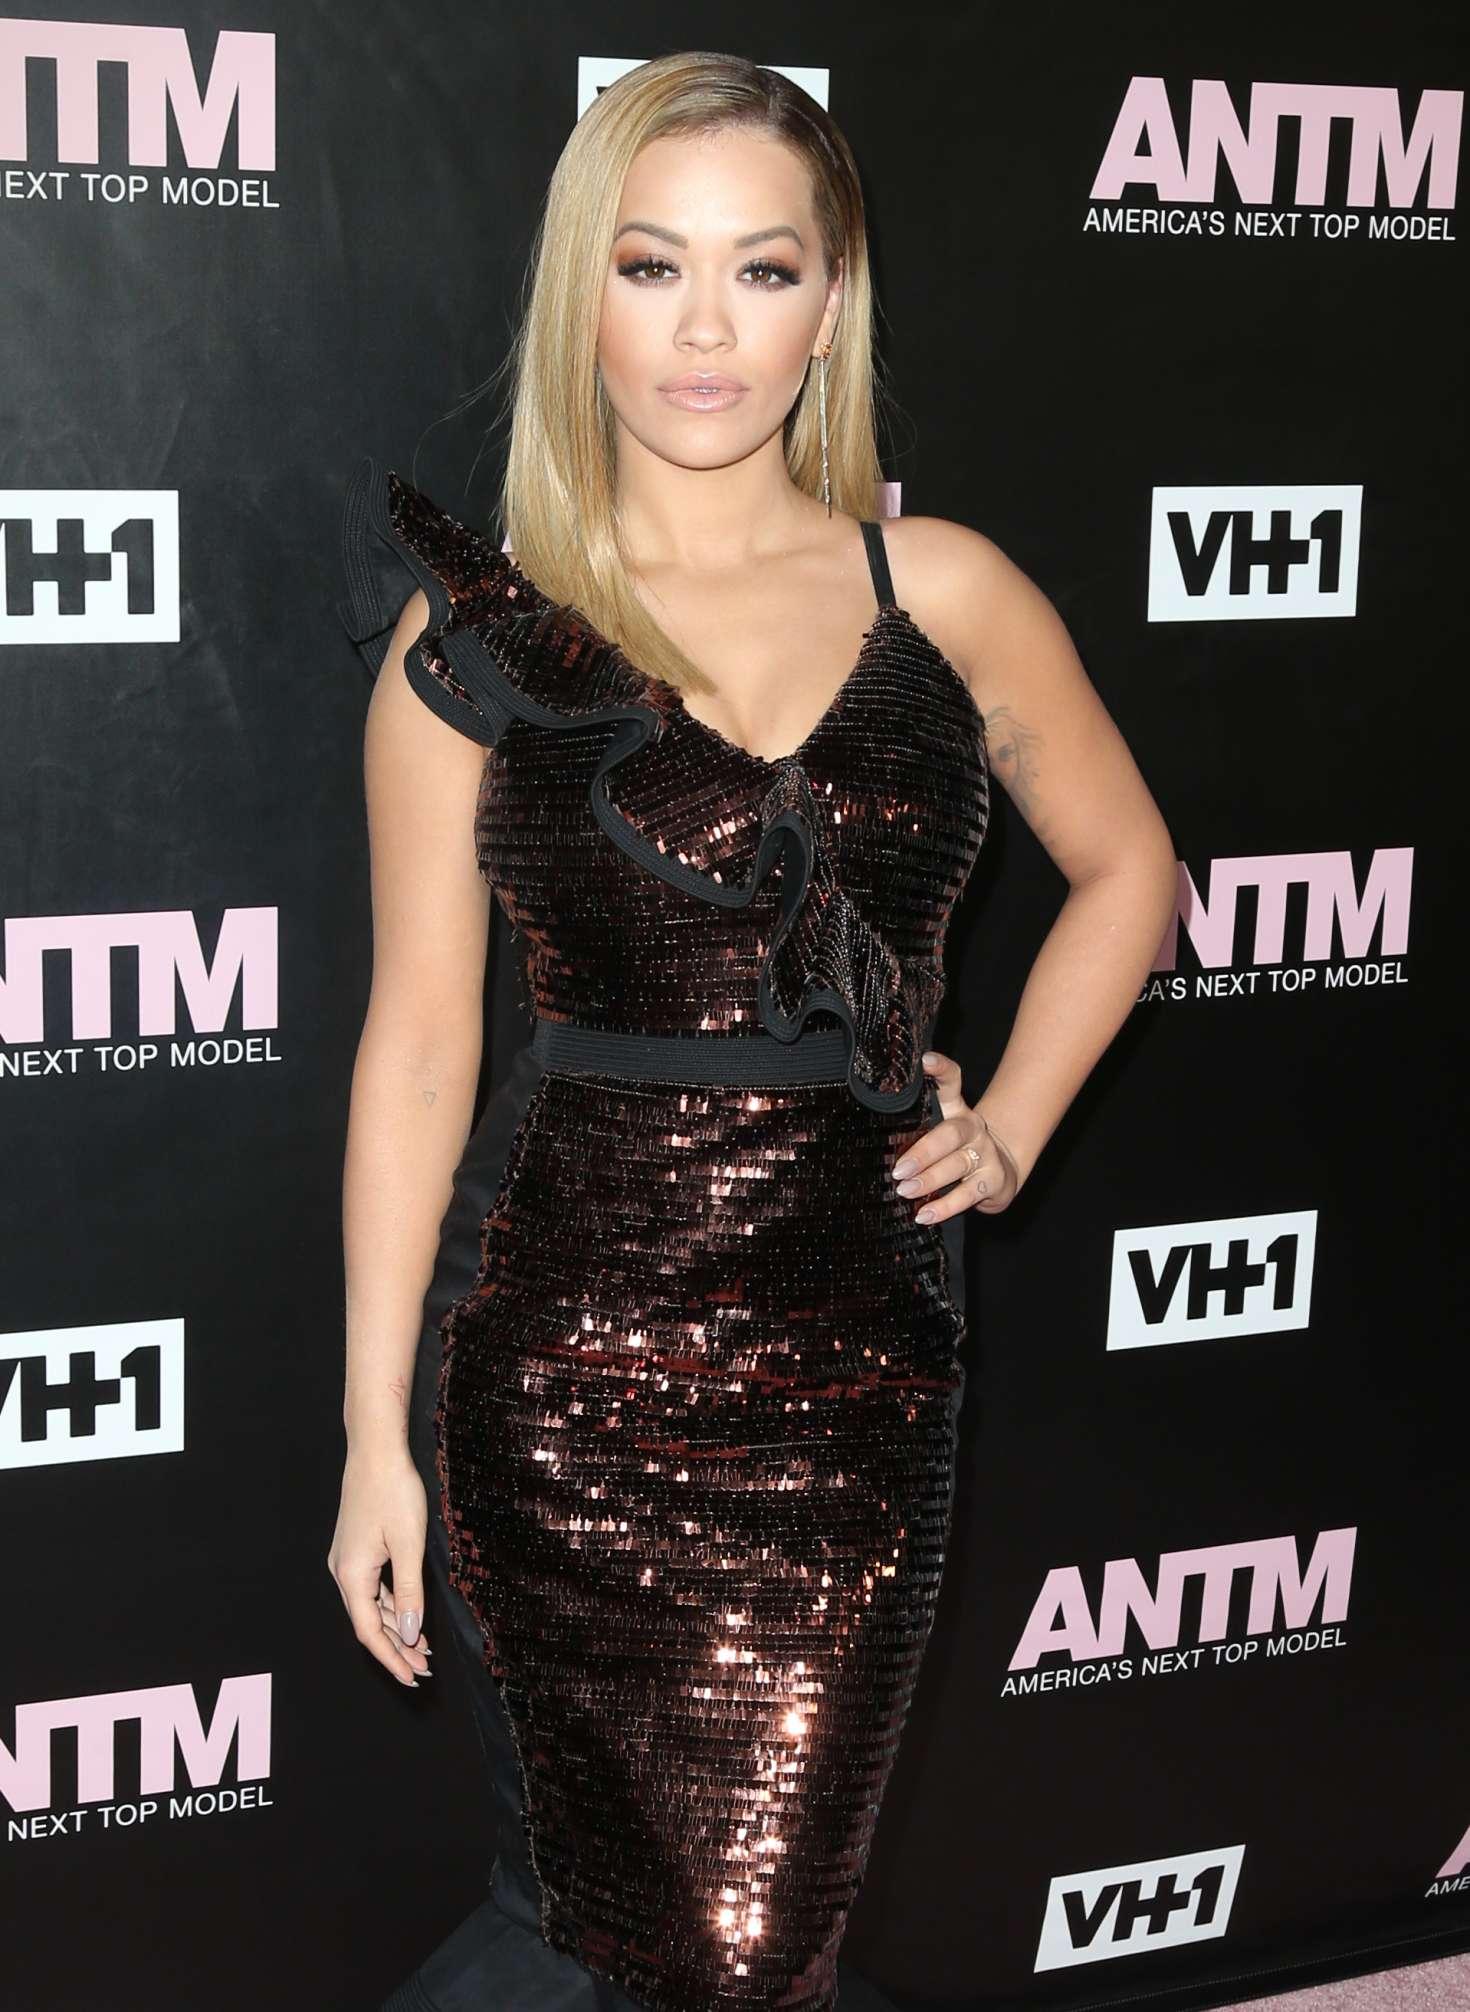 Rita Ora 2016 : Rita Ora: Americas Next Top Model Premiere Party -43